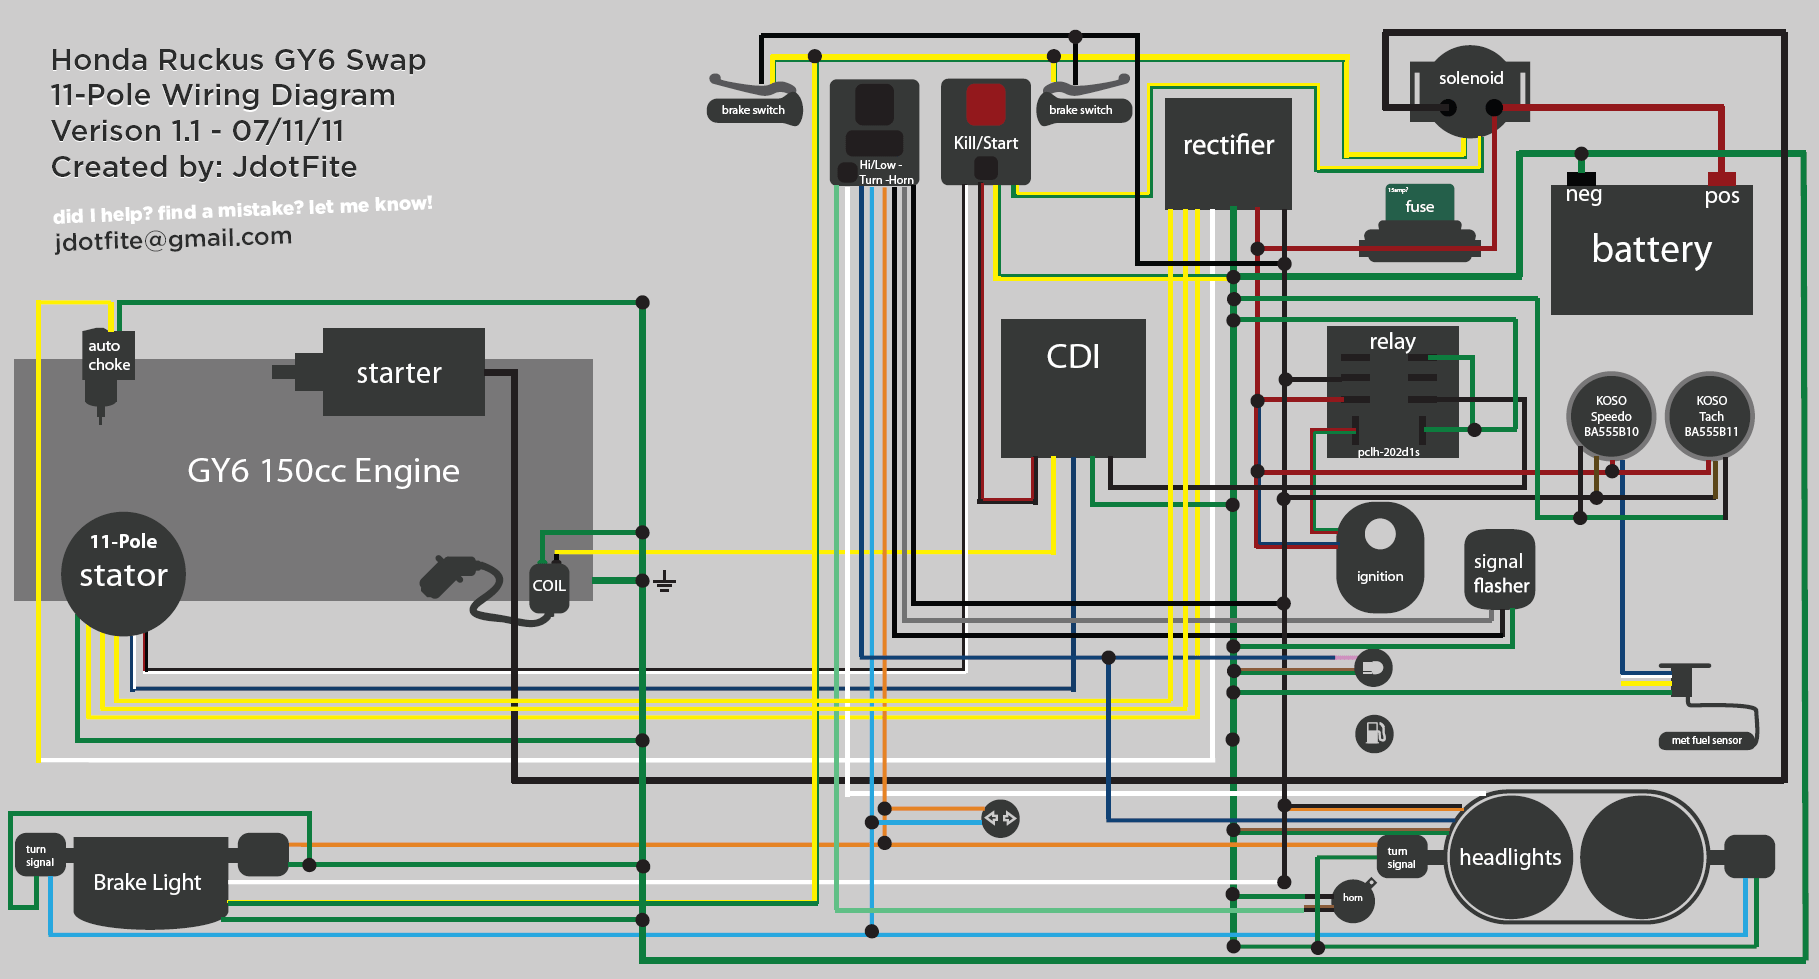 [NRIO_4796]   Roketa 250cc Go Kart Wiring Diagram - Minn Kota Wiring Diagram Photo Album  Wire Images for Wiring Diagram Schematics | 250cc Roketa Wiring Harness |  | Wiring Diagram and Schematics